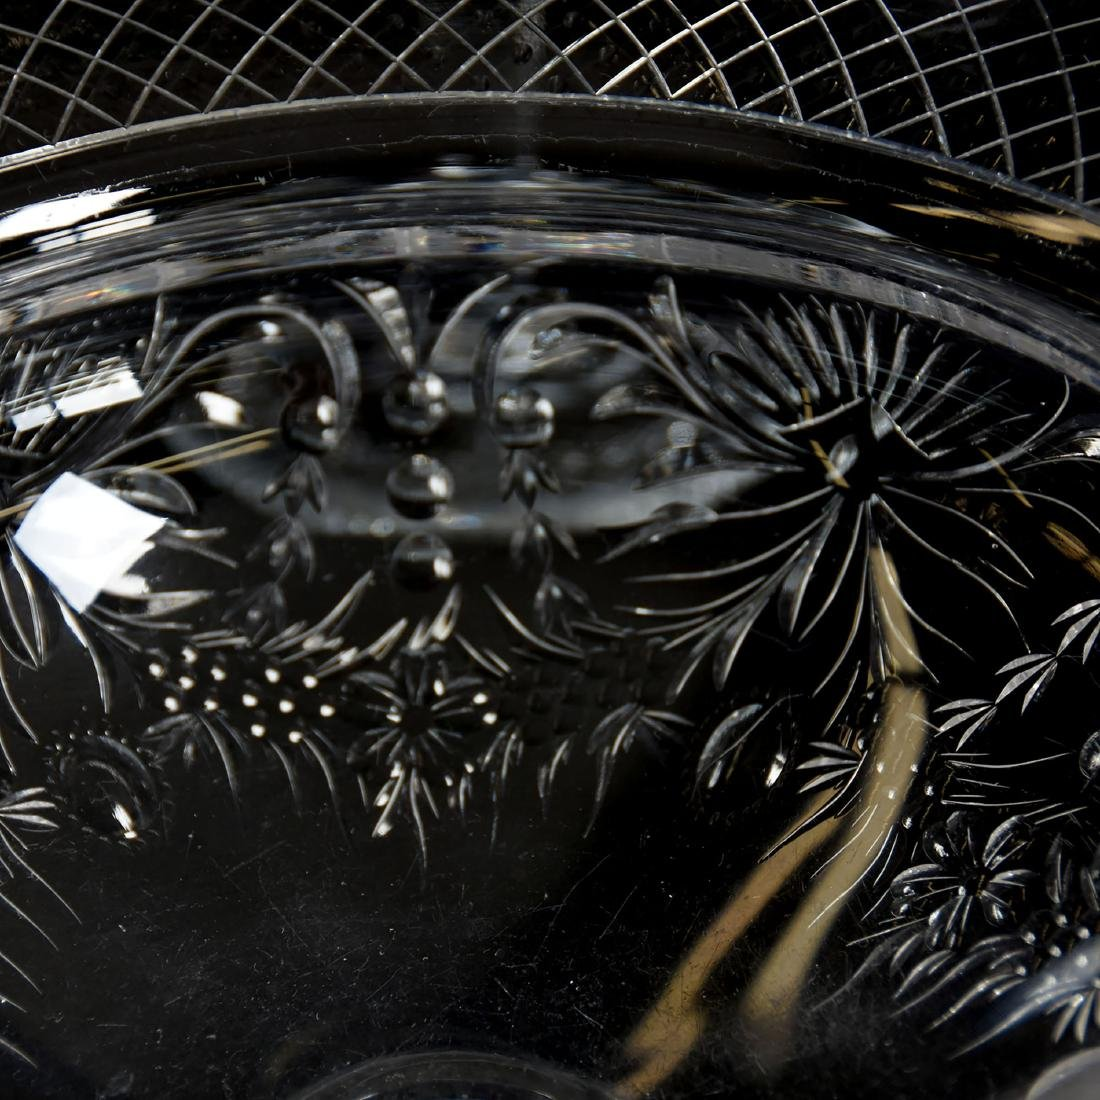 Four Piece Set, Engraved Floral Medallion Design - 4